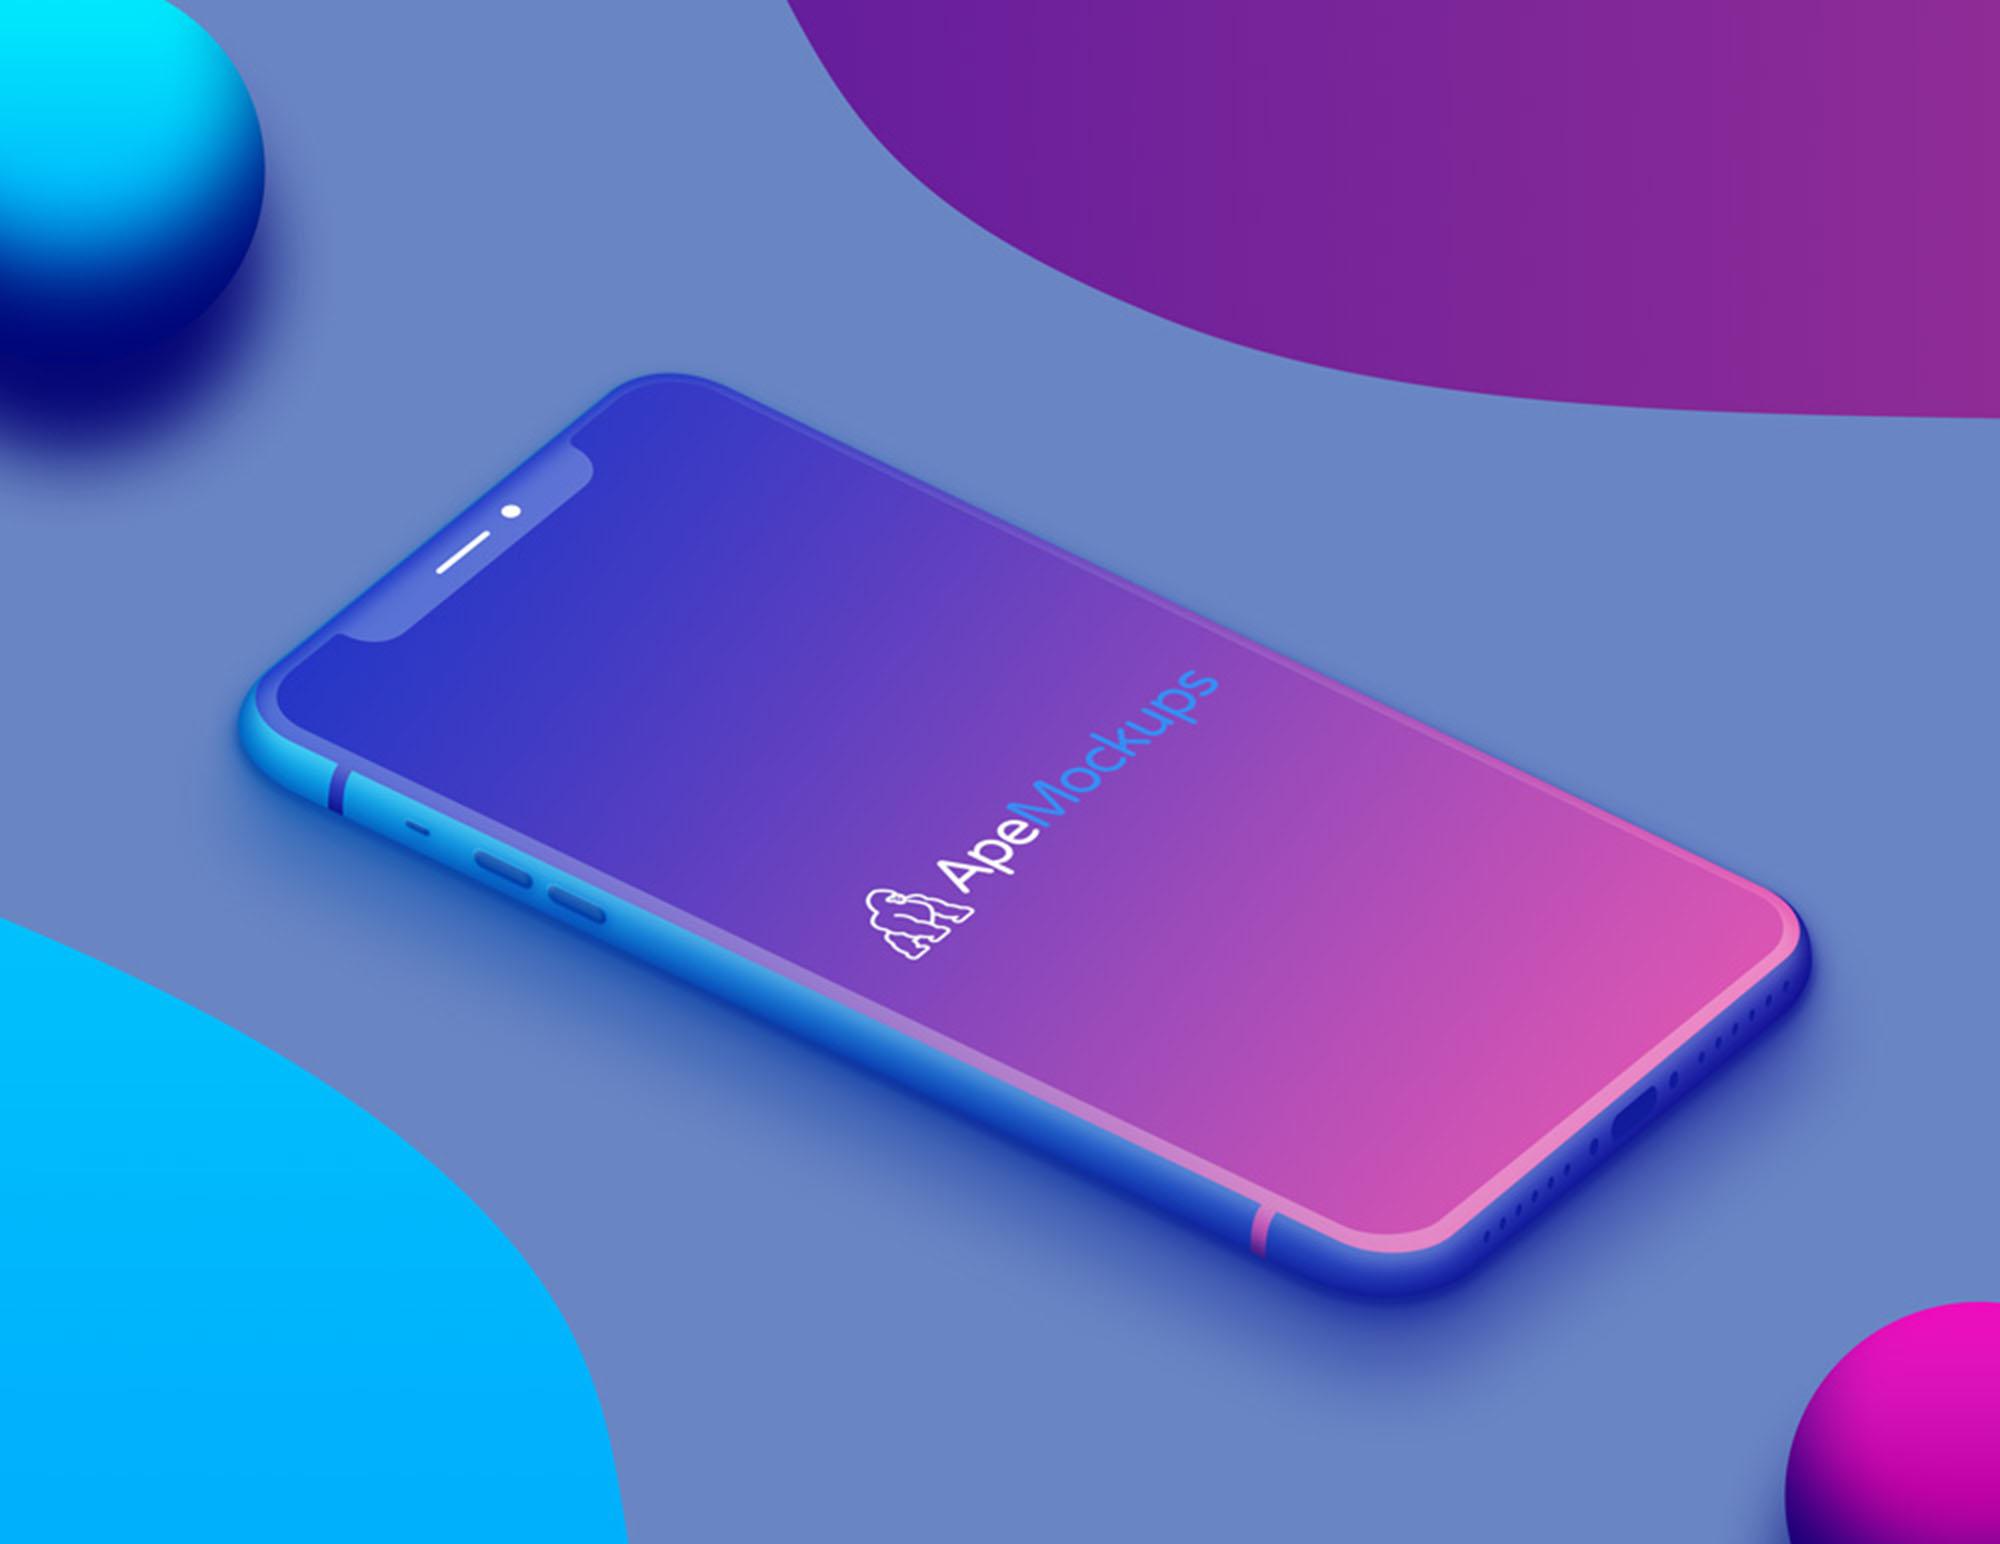 Colorful iPhone X Mockup